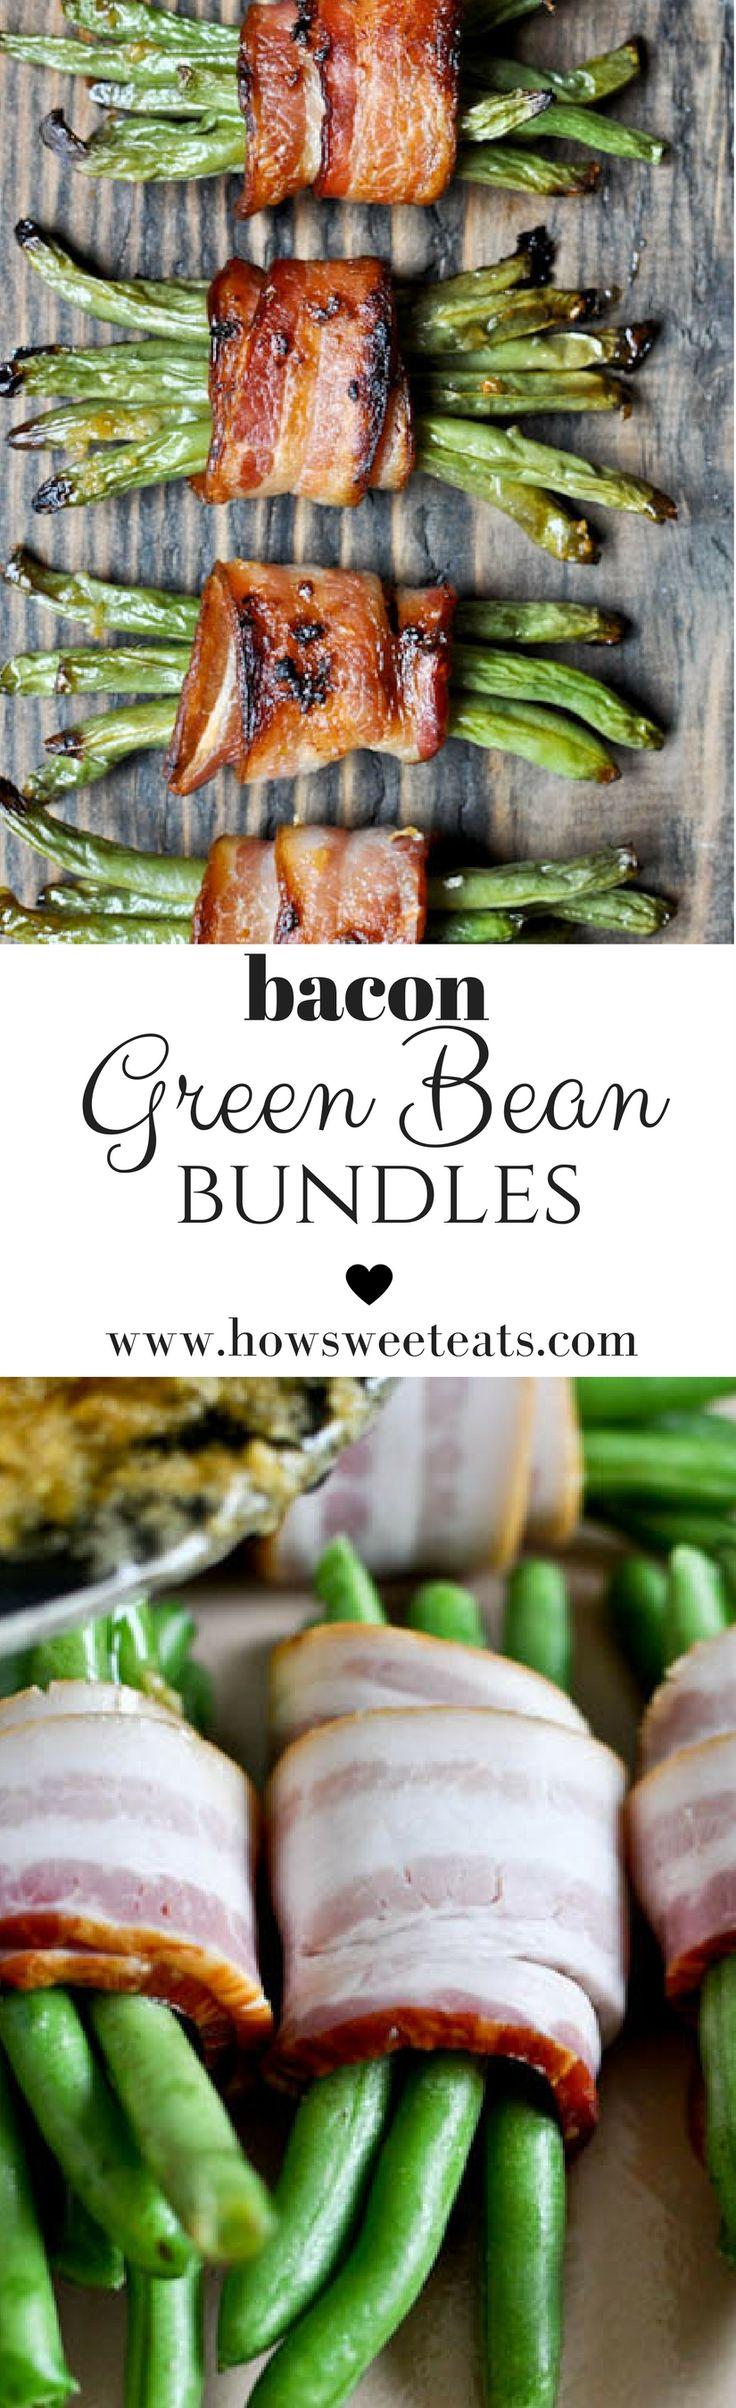 Bacon Green Bean Bundles I howsweeteats.com @howsweeteats